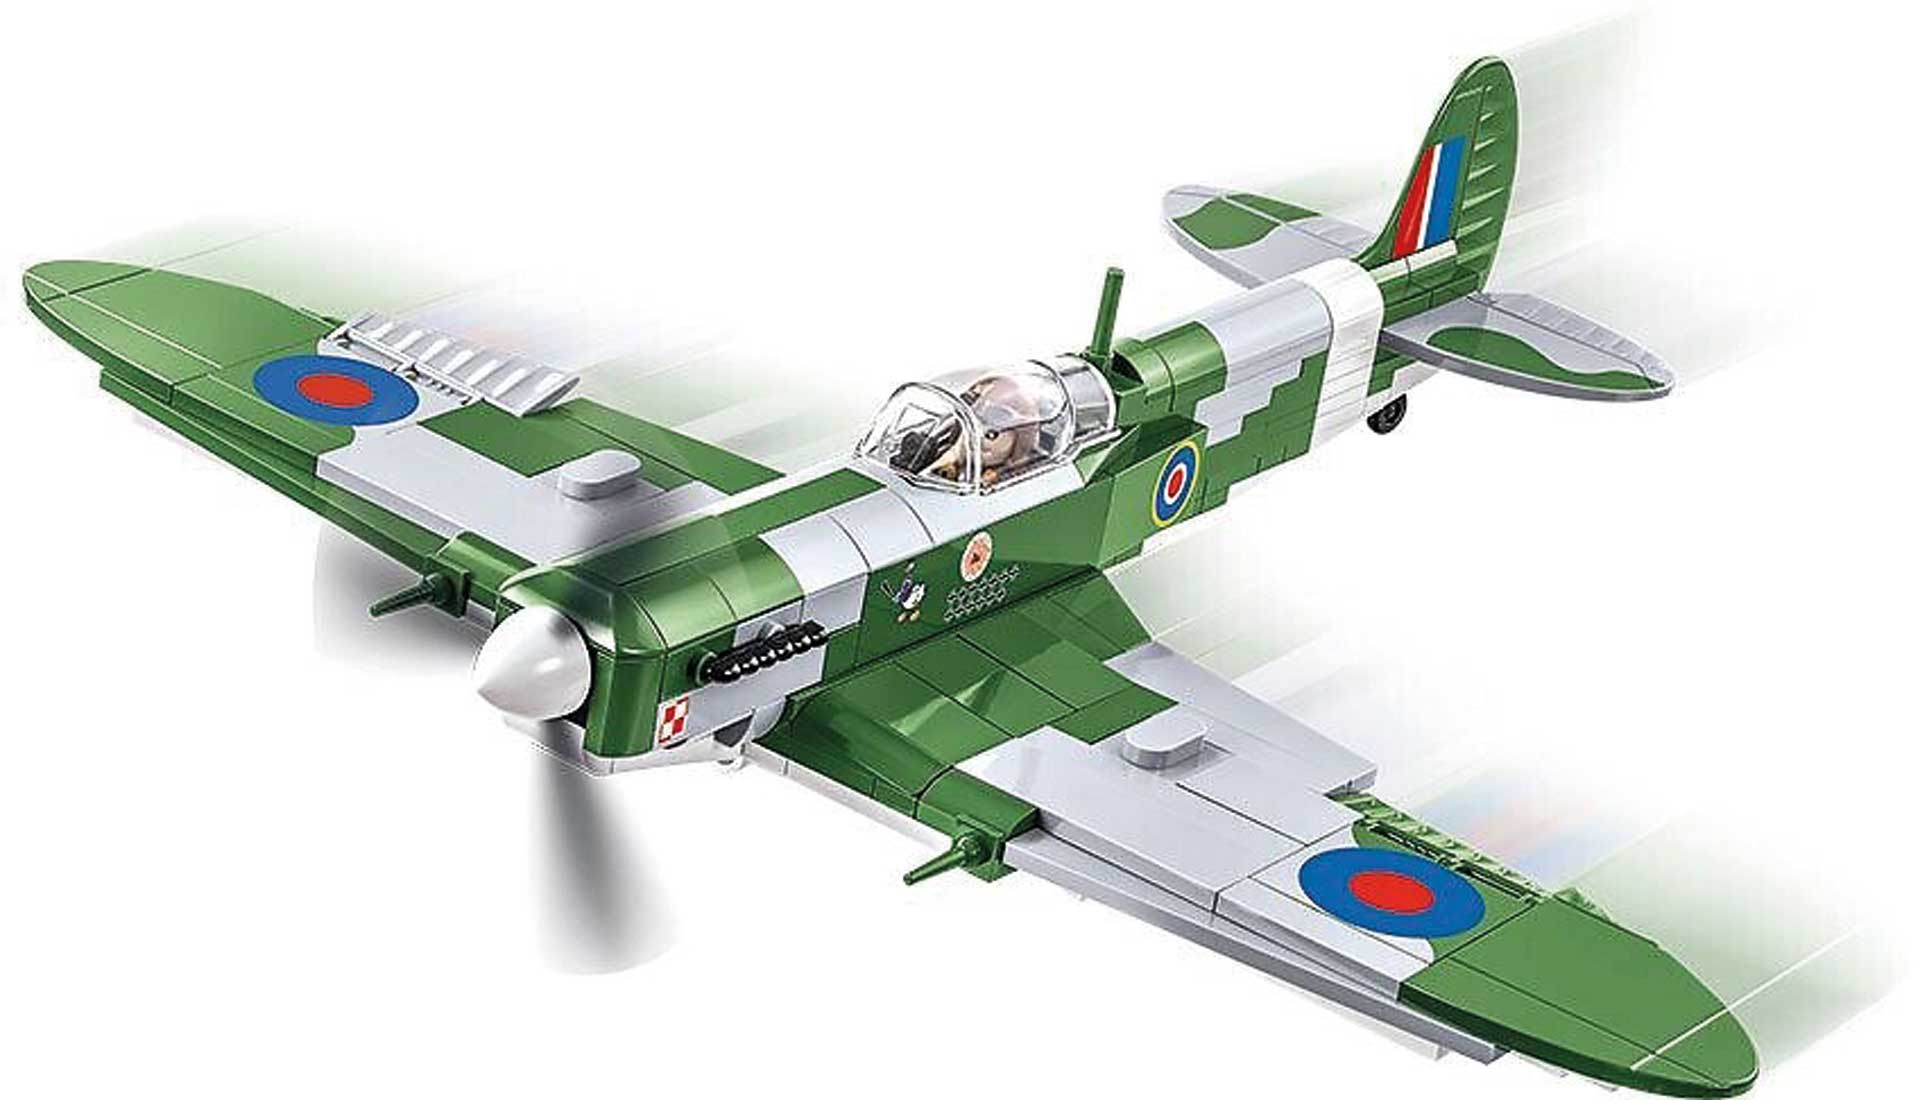 COBI Supermarine Spitfire Mk. VB (280 Teile) Klemmbausteine